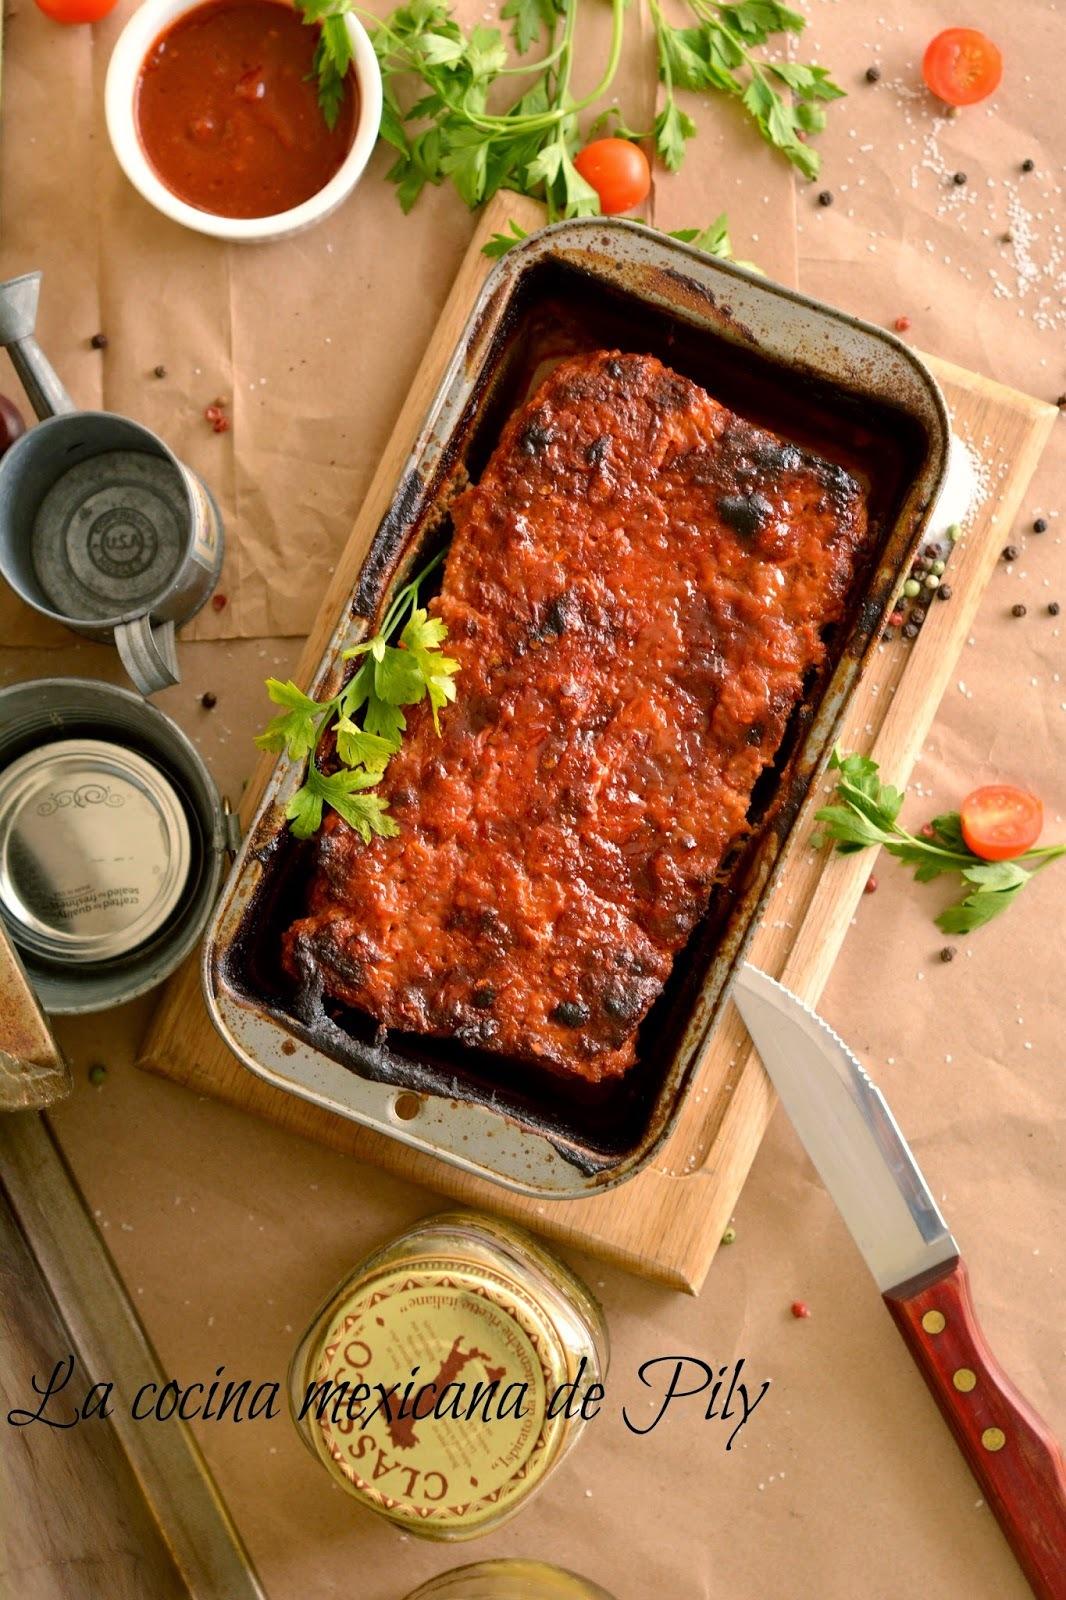 Pastel de Carne al Chipotle  - Chipotle Meatloaf